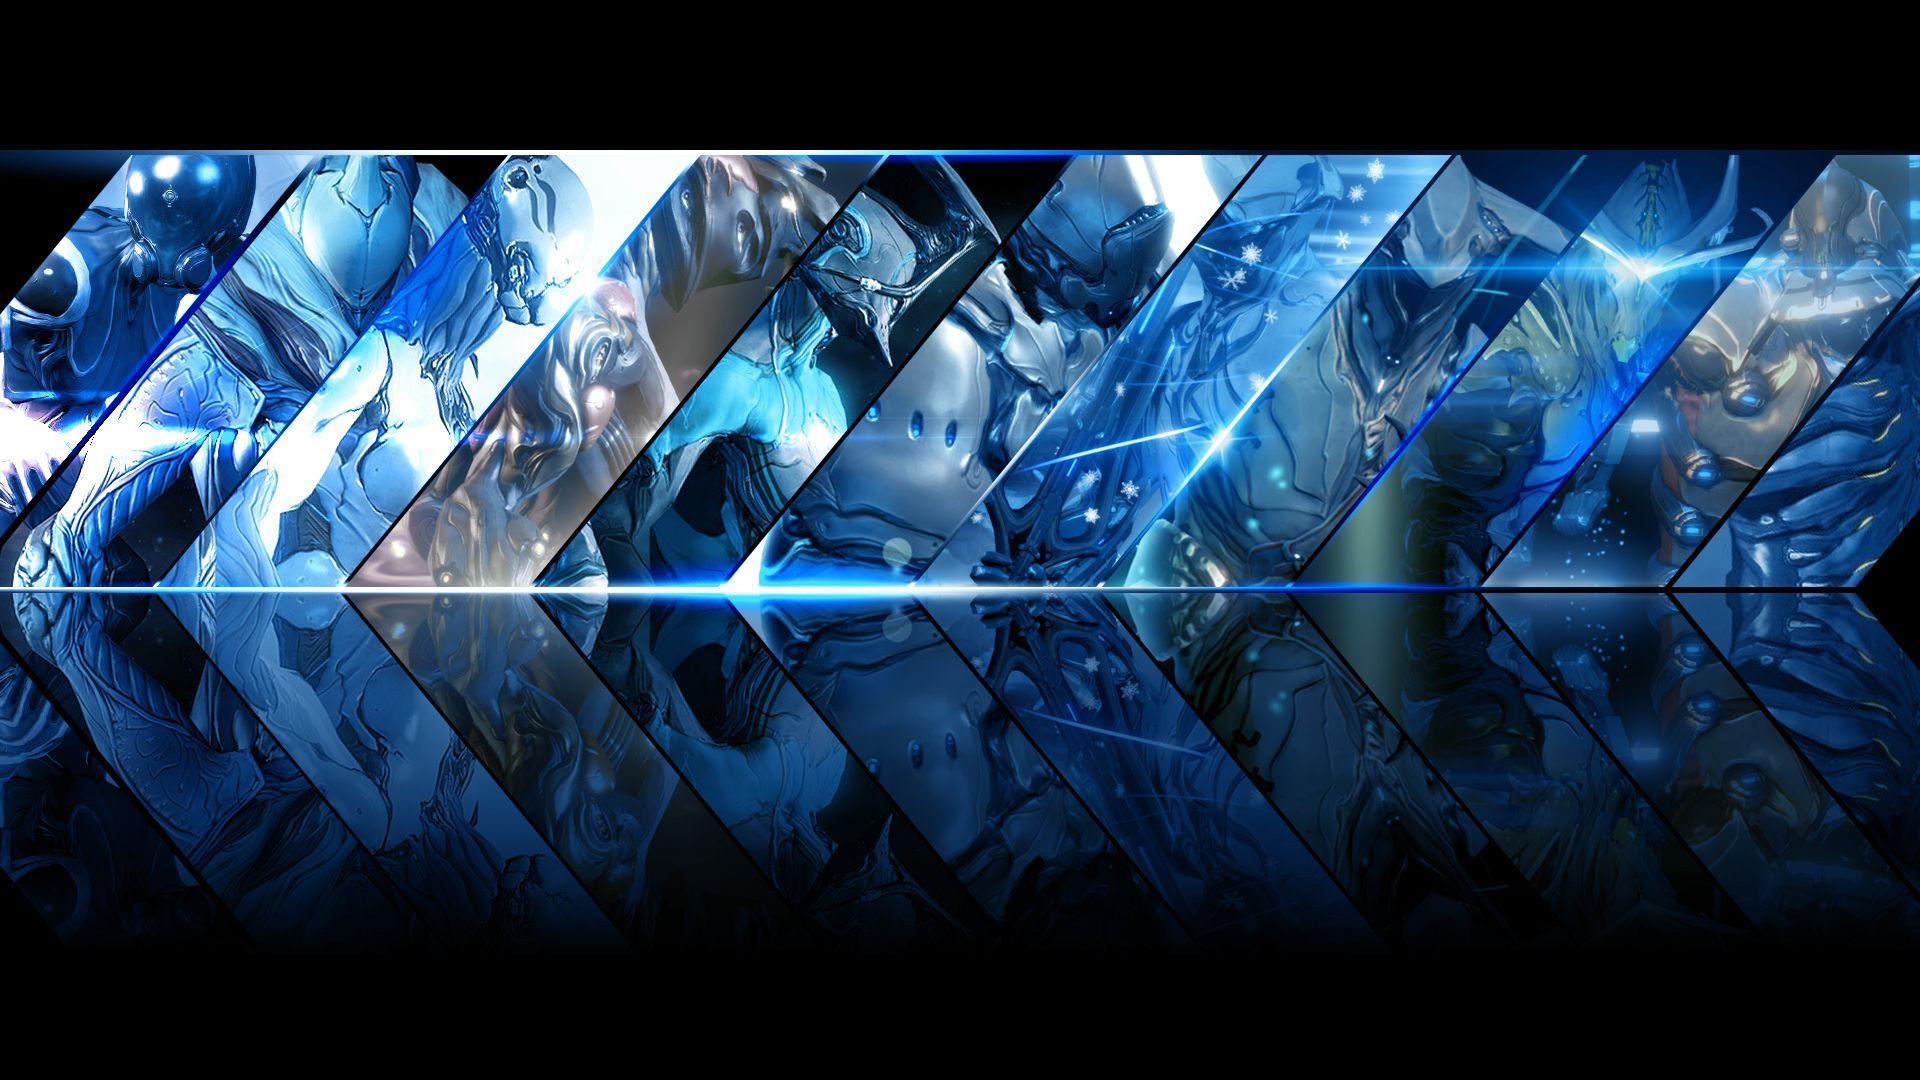 Badass Iphone Wallpaper Warframe Wallpapers High Quality Download Free